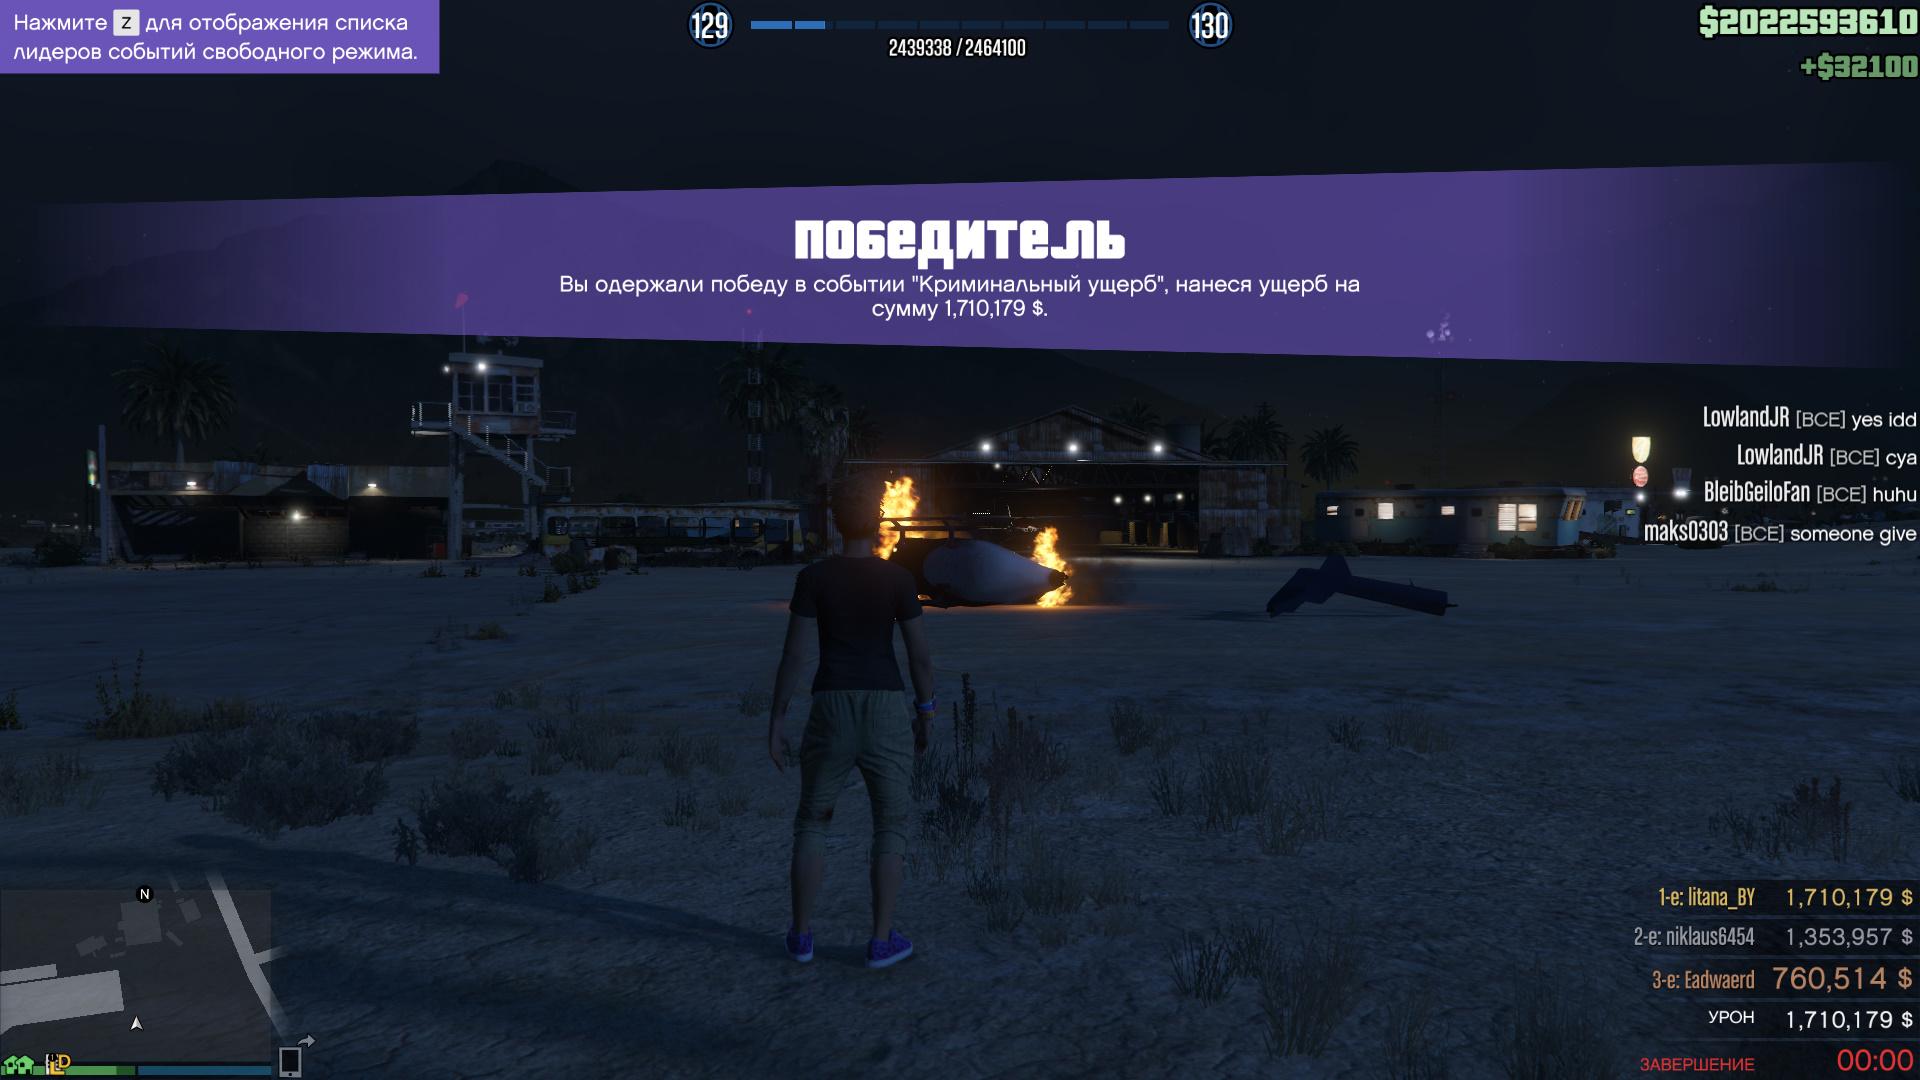 GTA5 2017-05-12 18-59-22-672.jpg - Grand Theft Auto 5 Приключения Красотки